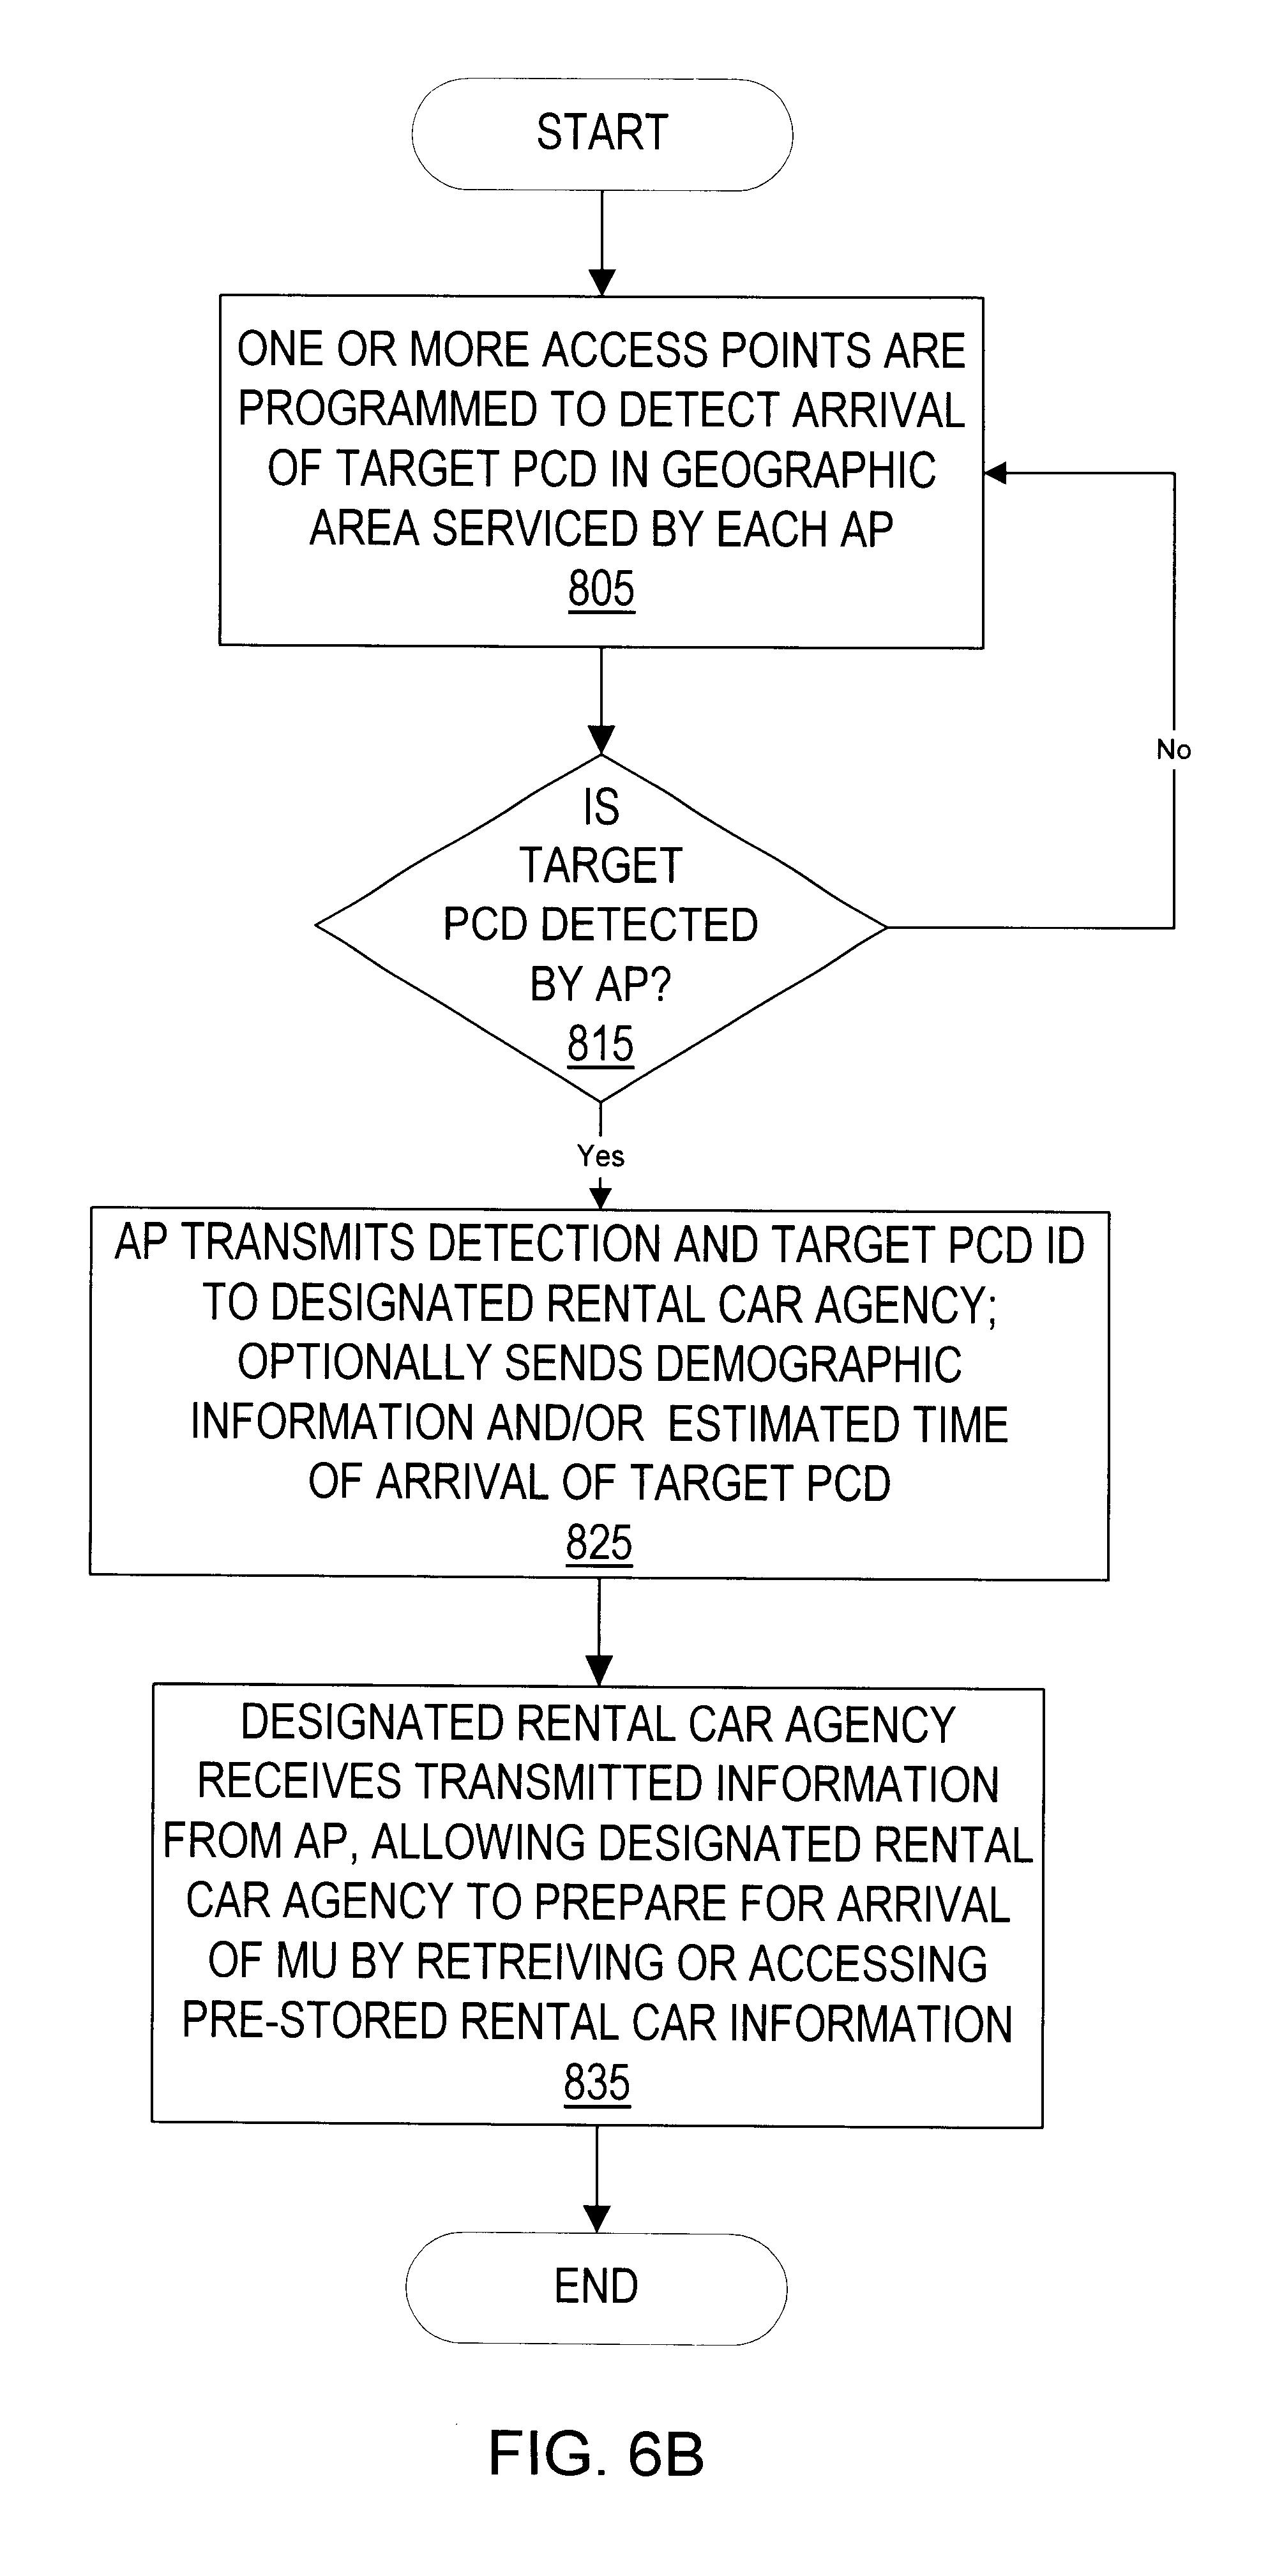 Patent US 6,414,635 B1